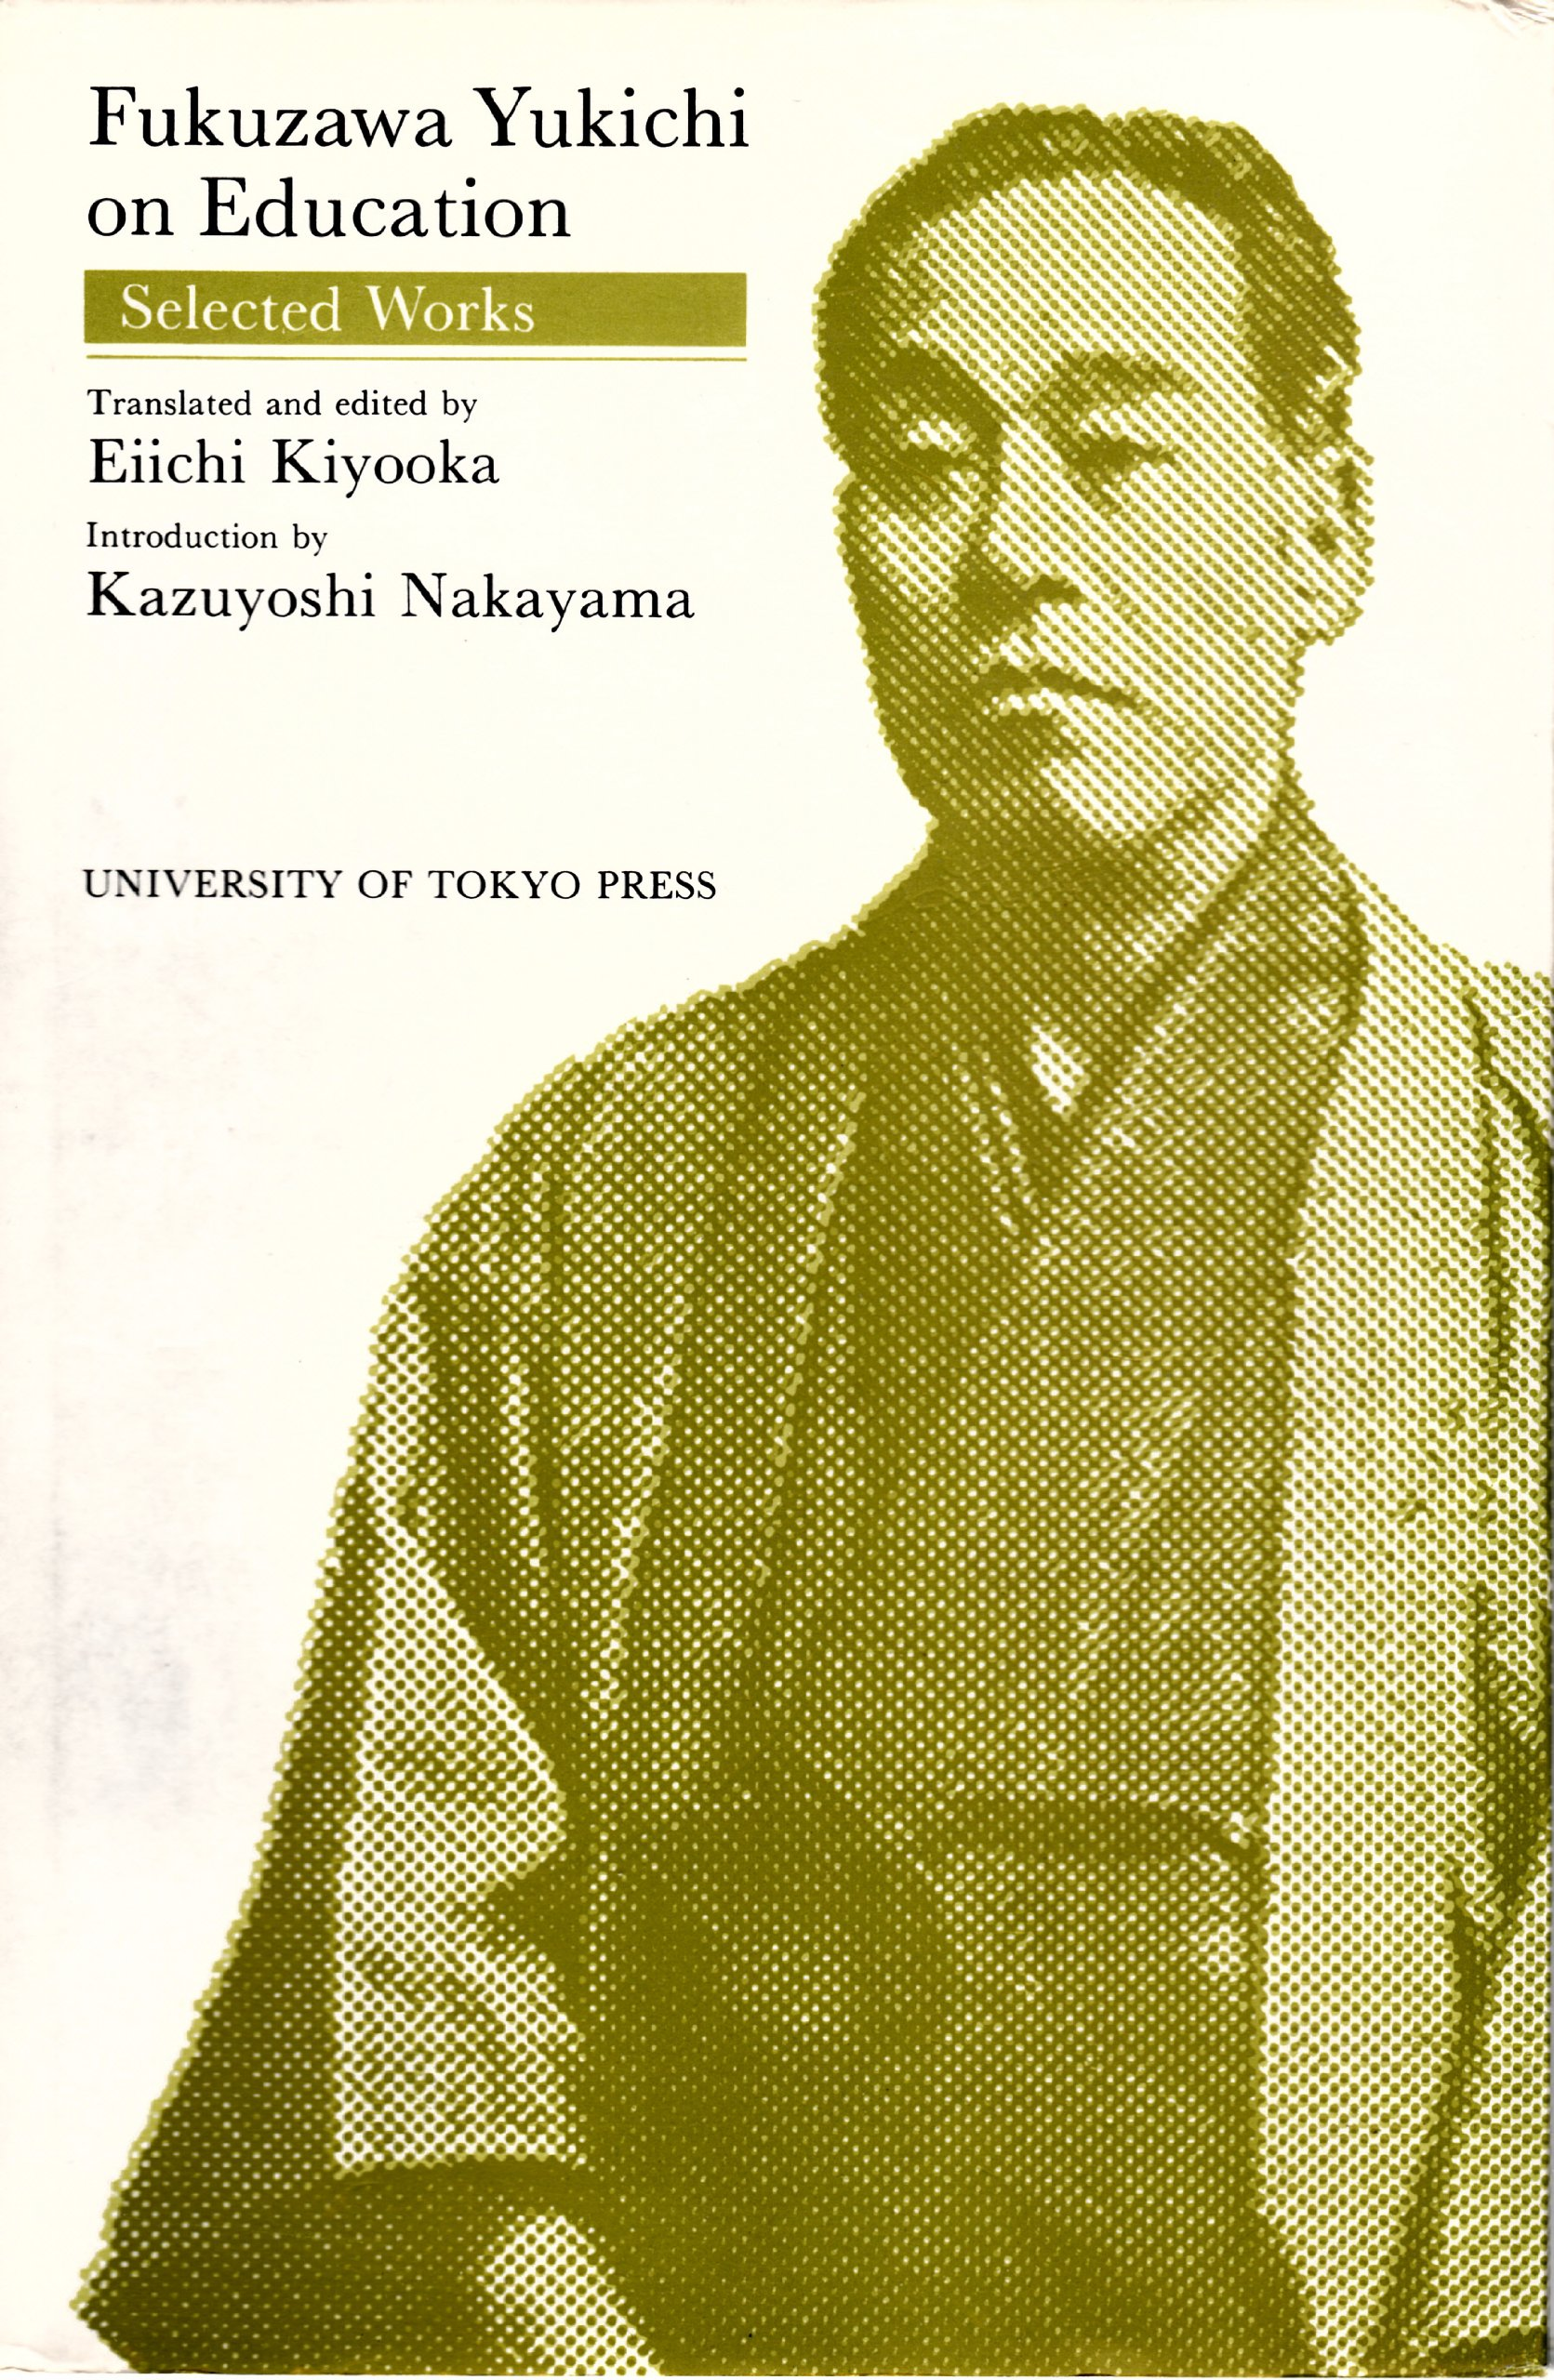 a discussion of fukuzawa yukichiss intellectual biases Journal of zhejiang university science formed the intellectual background of the movement for liberty as well as people¬ðs rights fukuzawa yukichi.